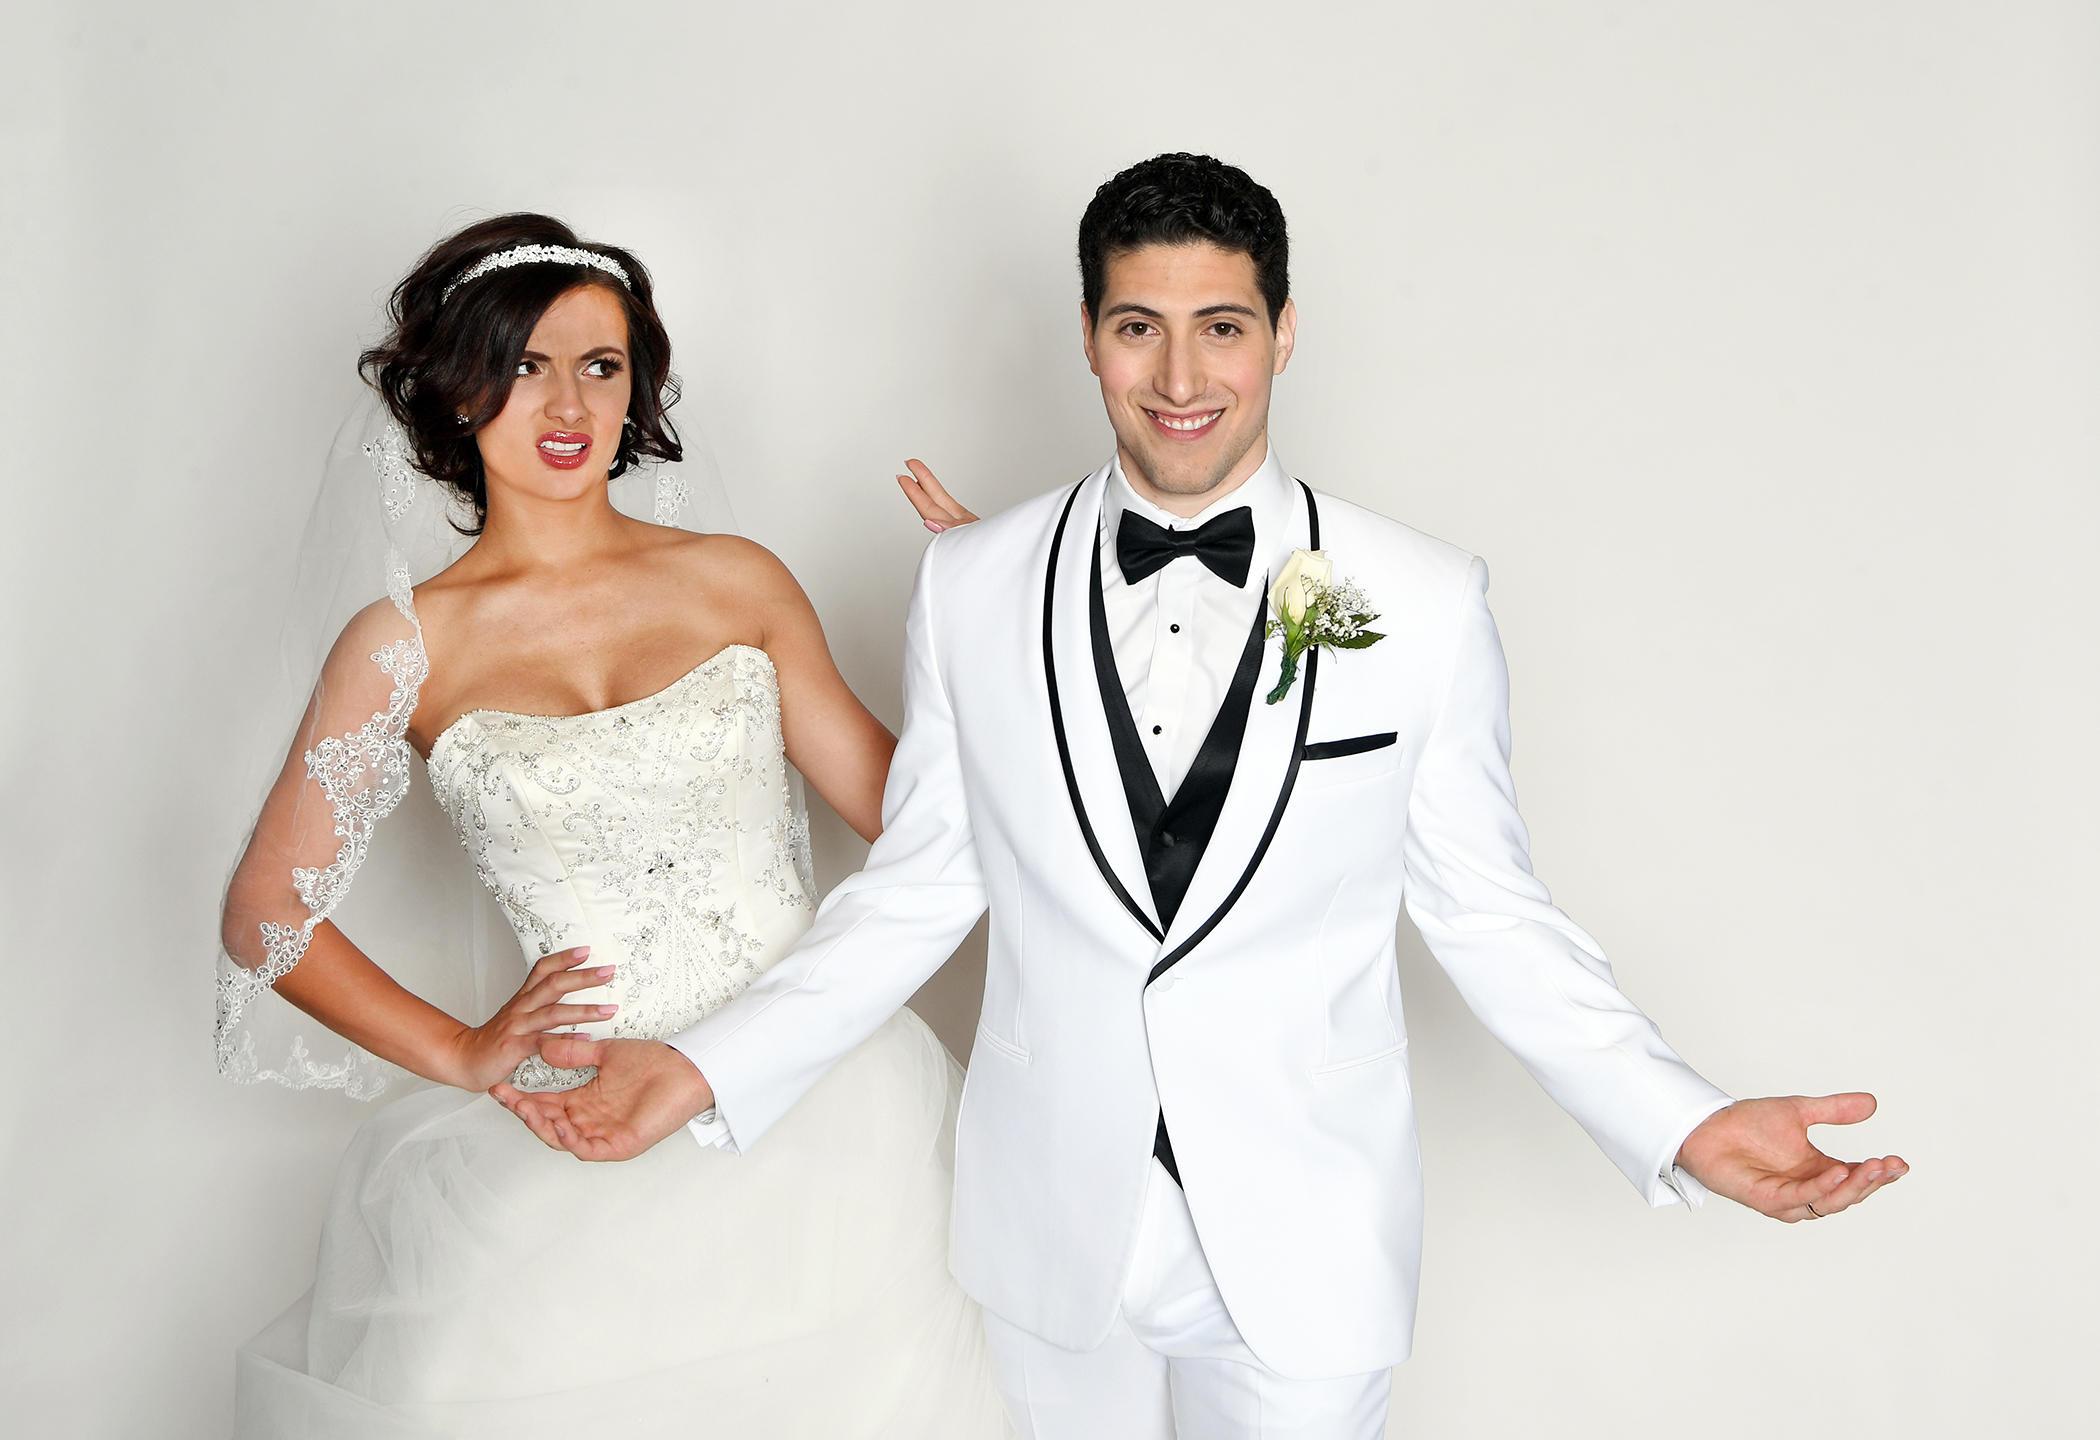 Tony N' Tina's Wedding image 1